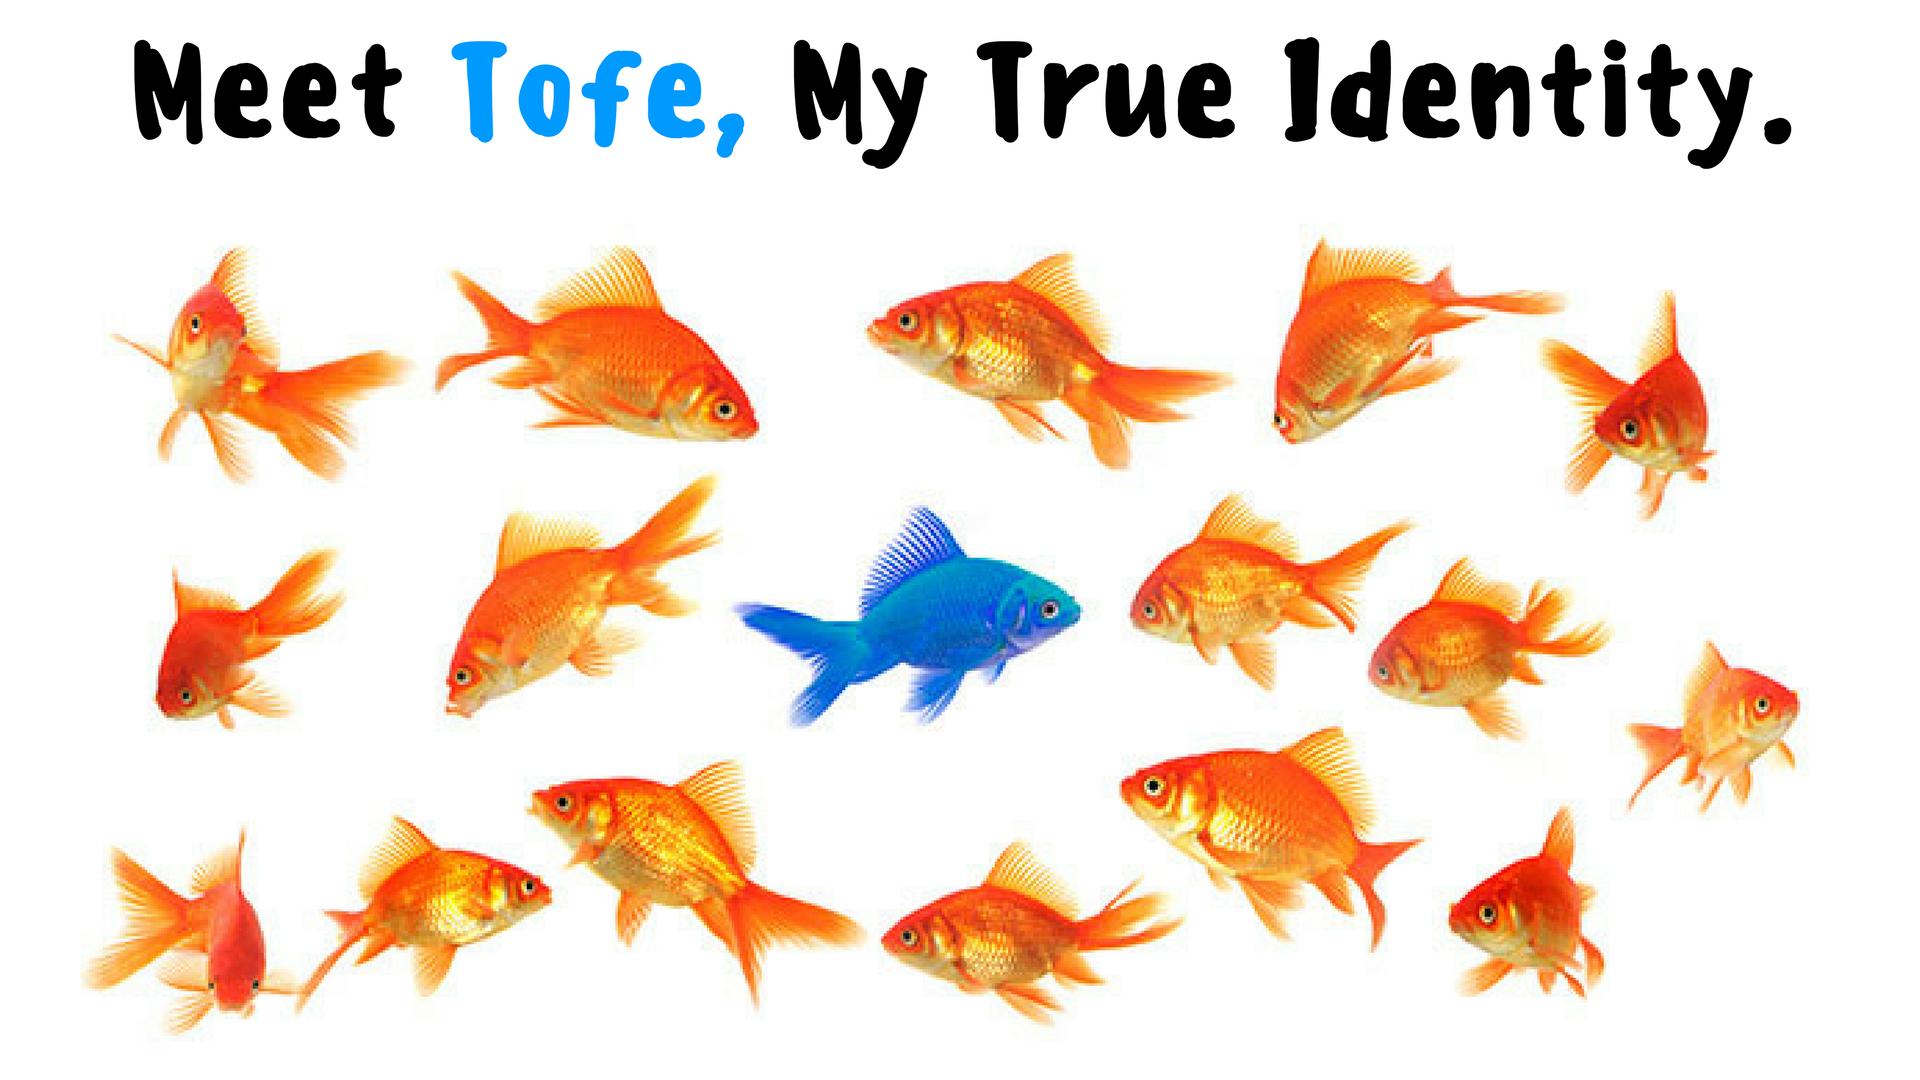 Meet Tofe, My True Identity.png